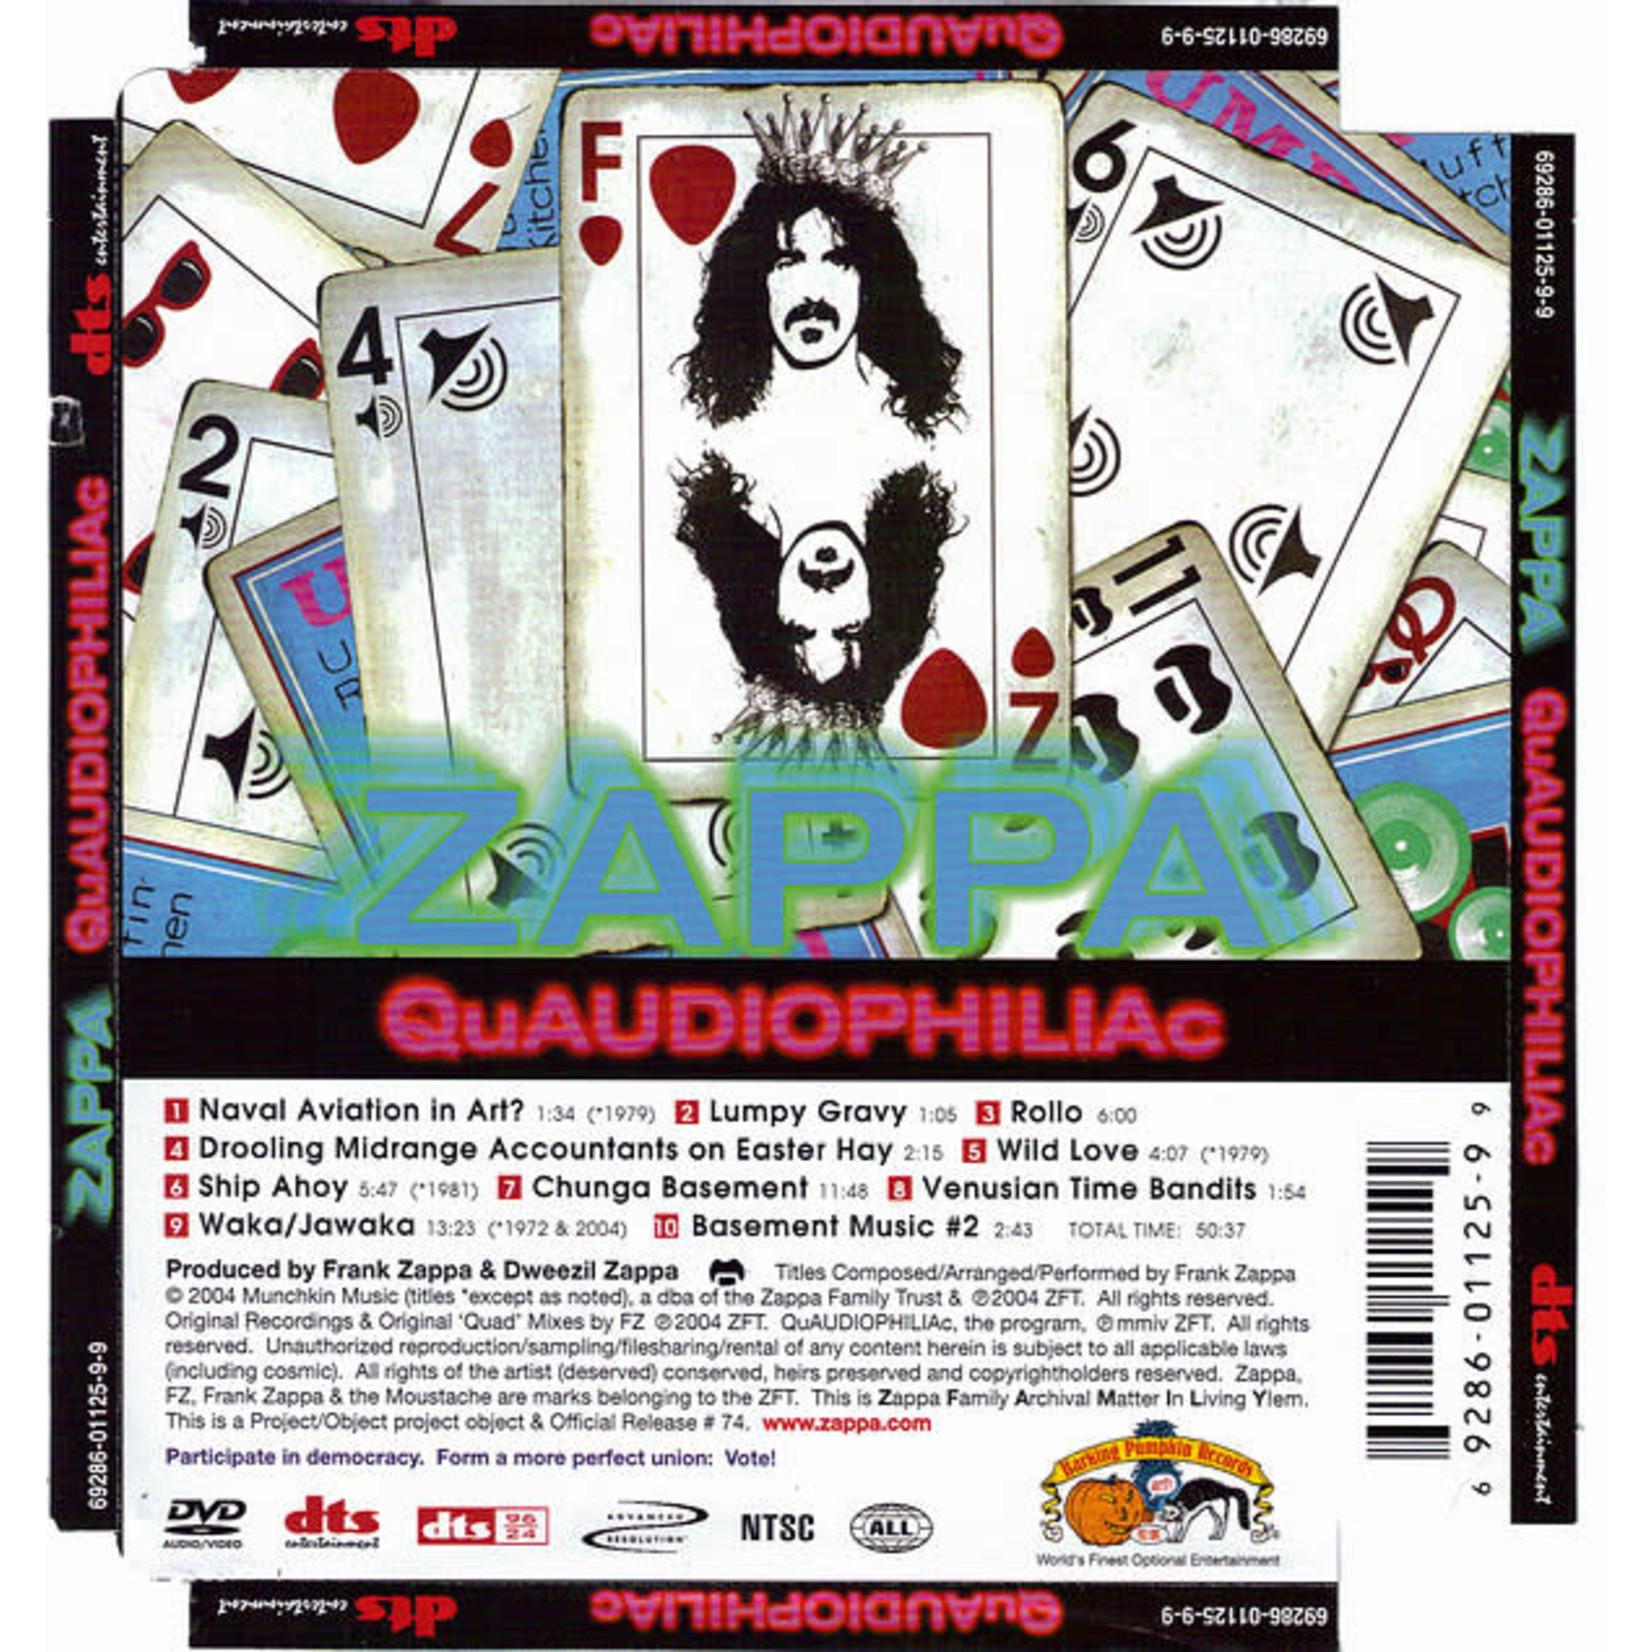 Compact Disc Frank Zappa - QuAUDIOPHILIAc (Used)